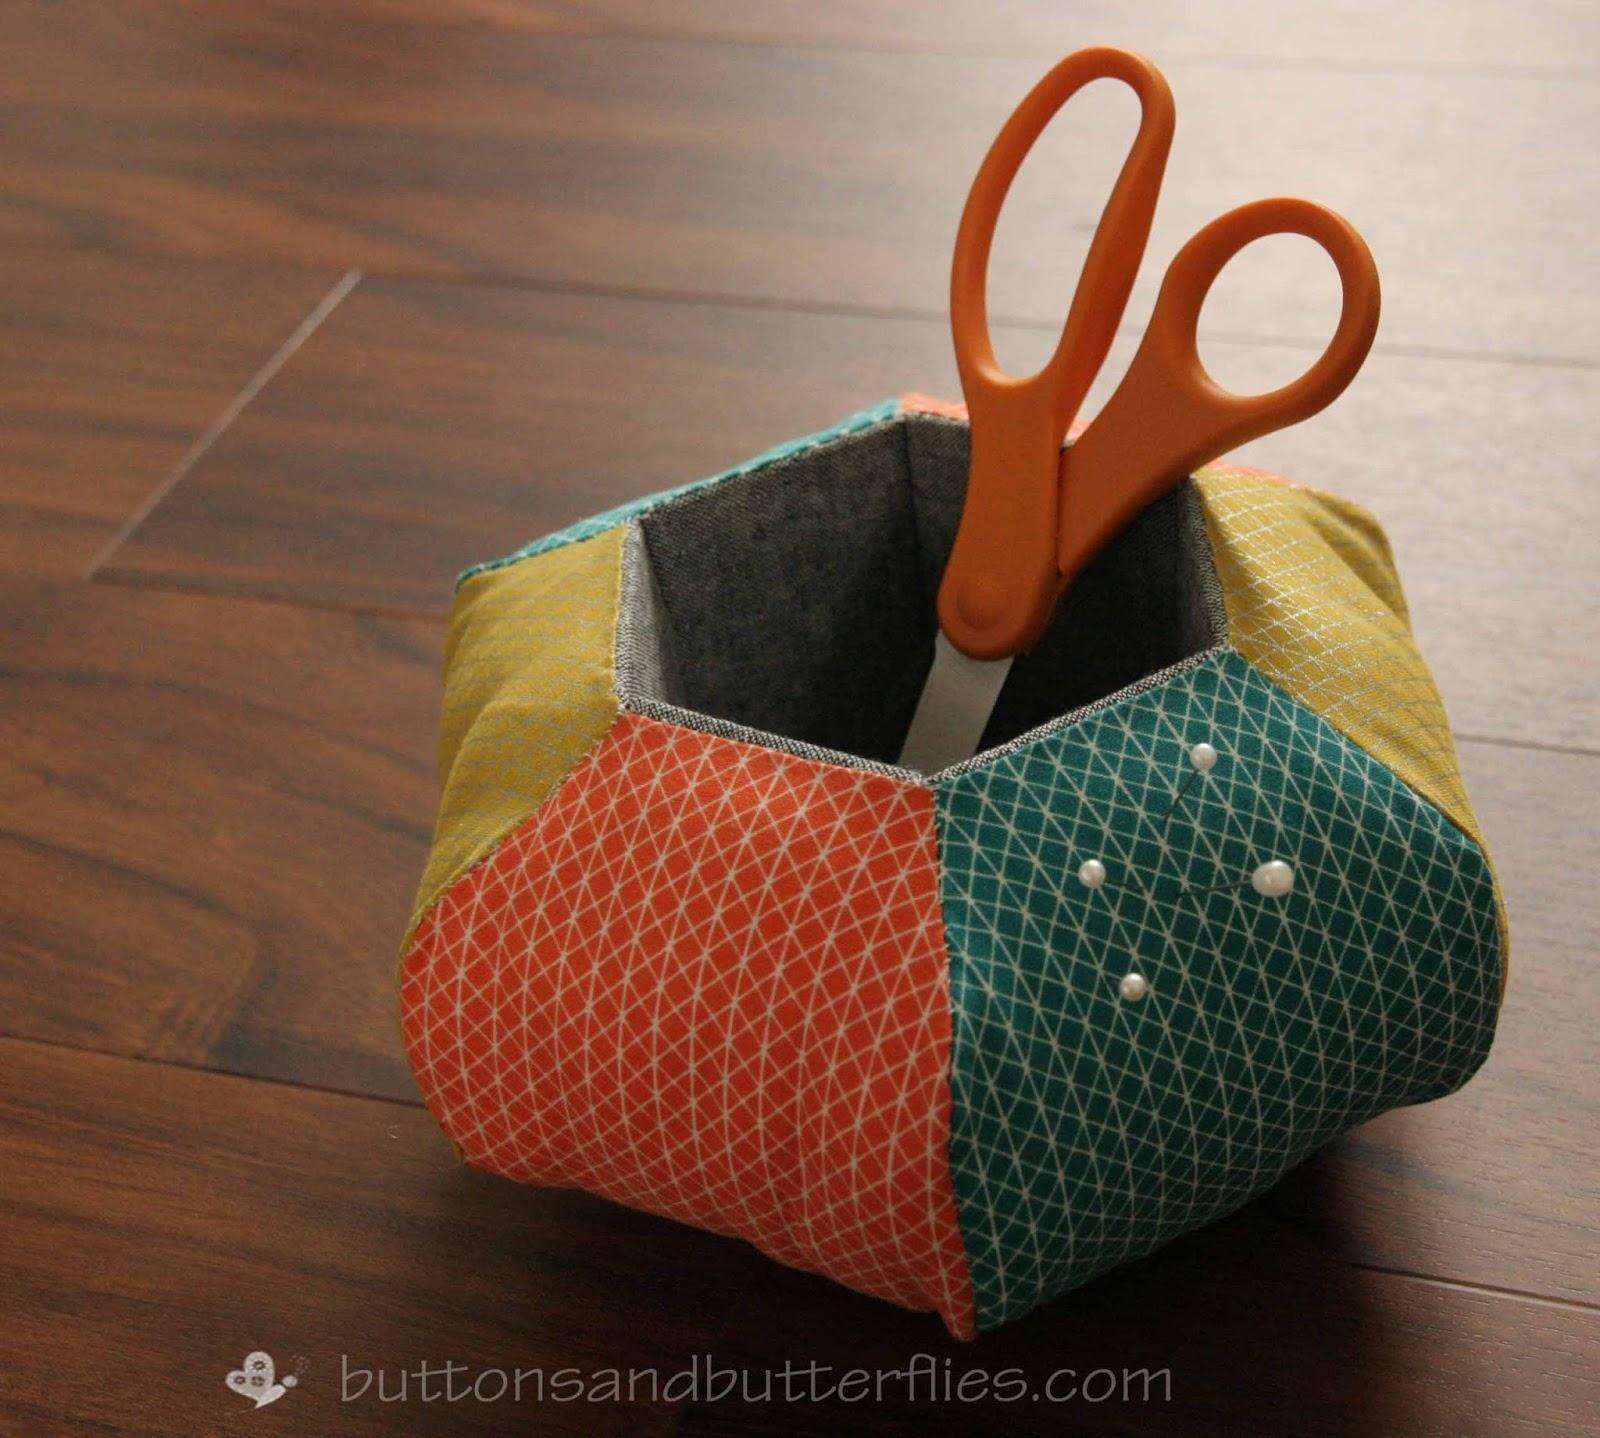 Buttons and Butterflies: Hexie Caddy {Pincushion}